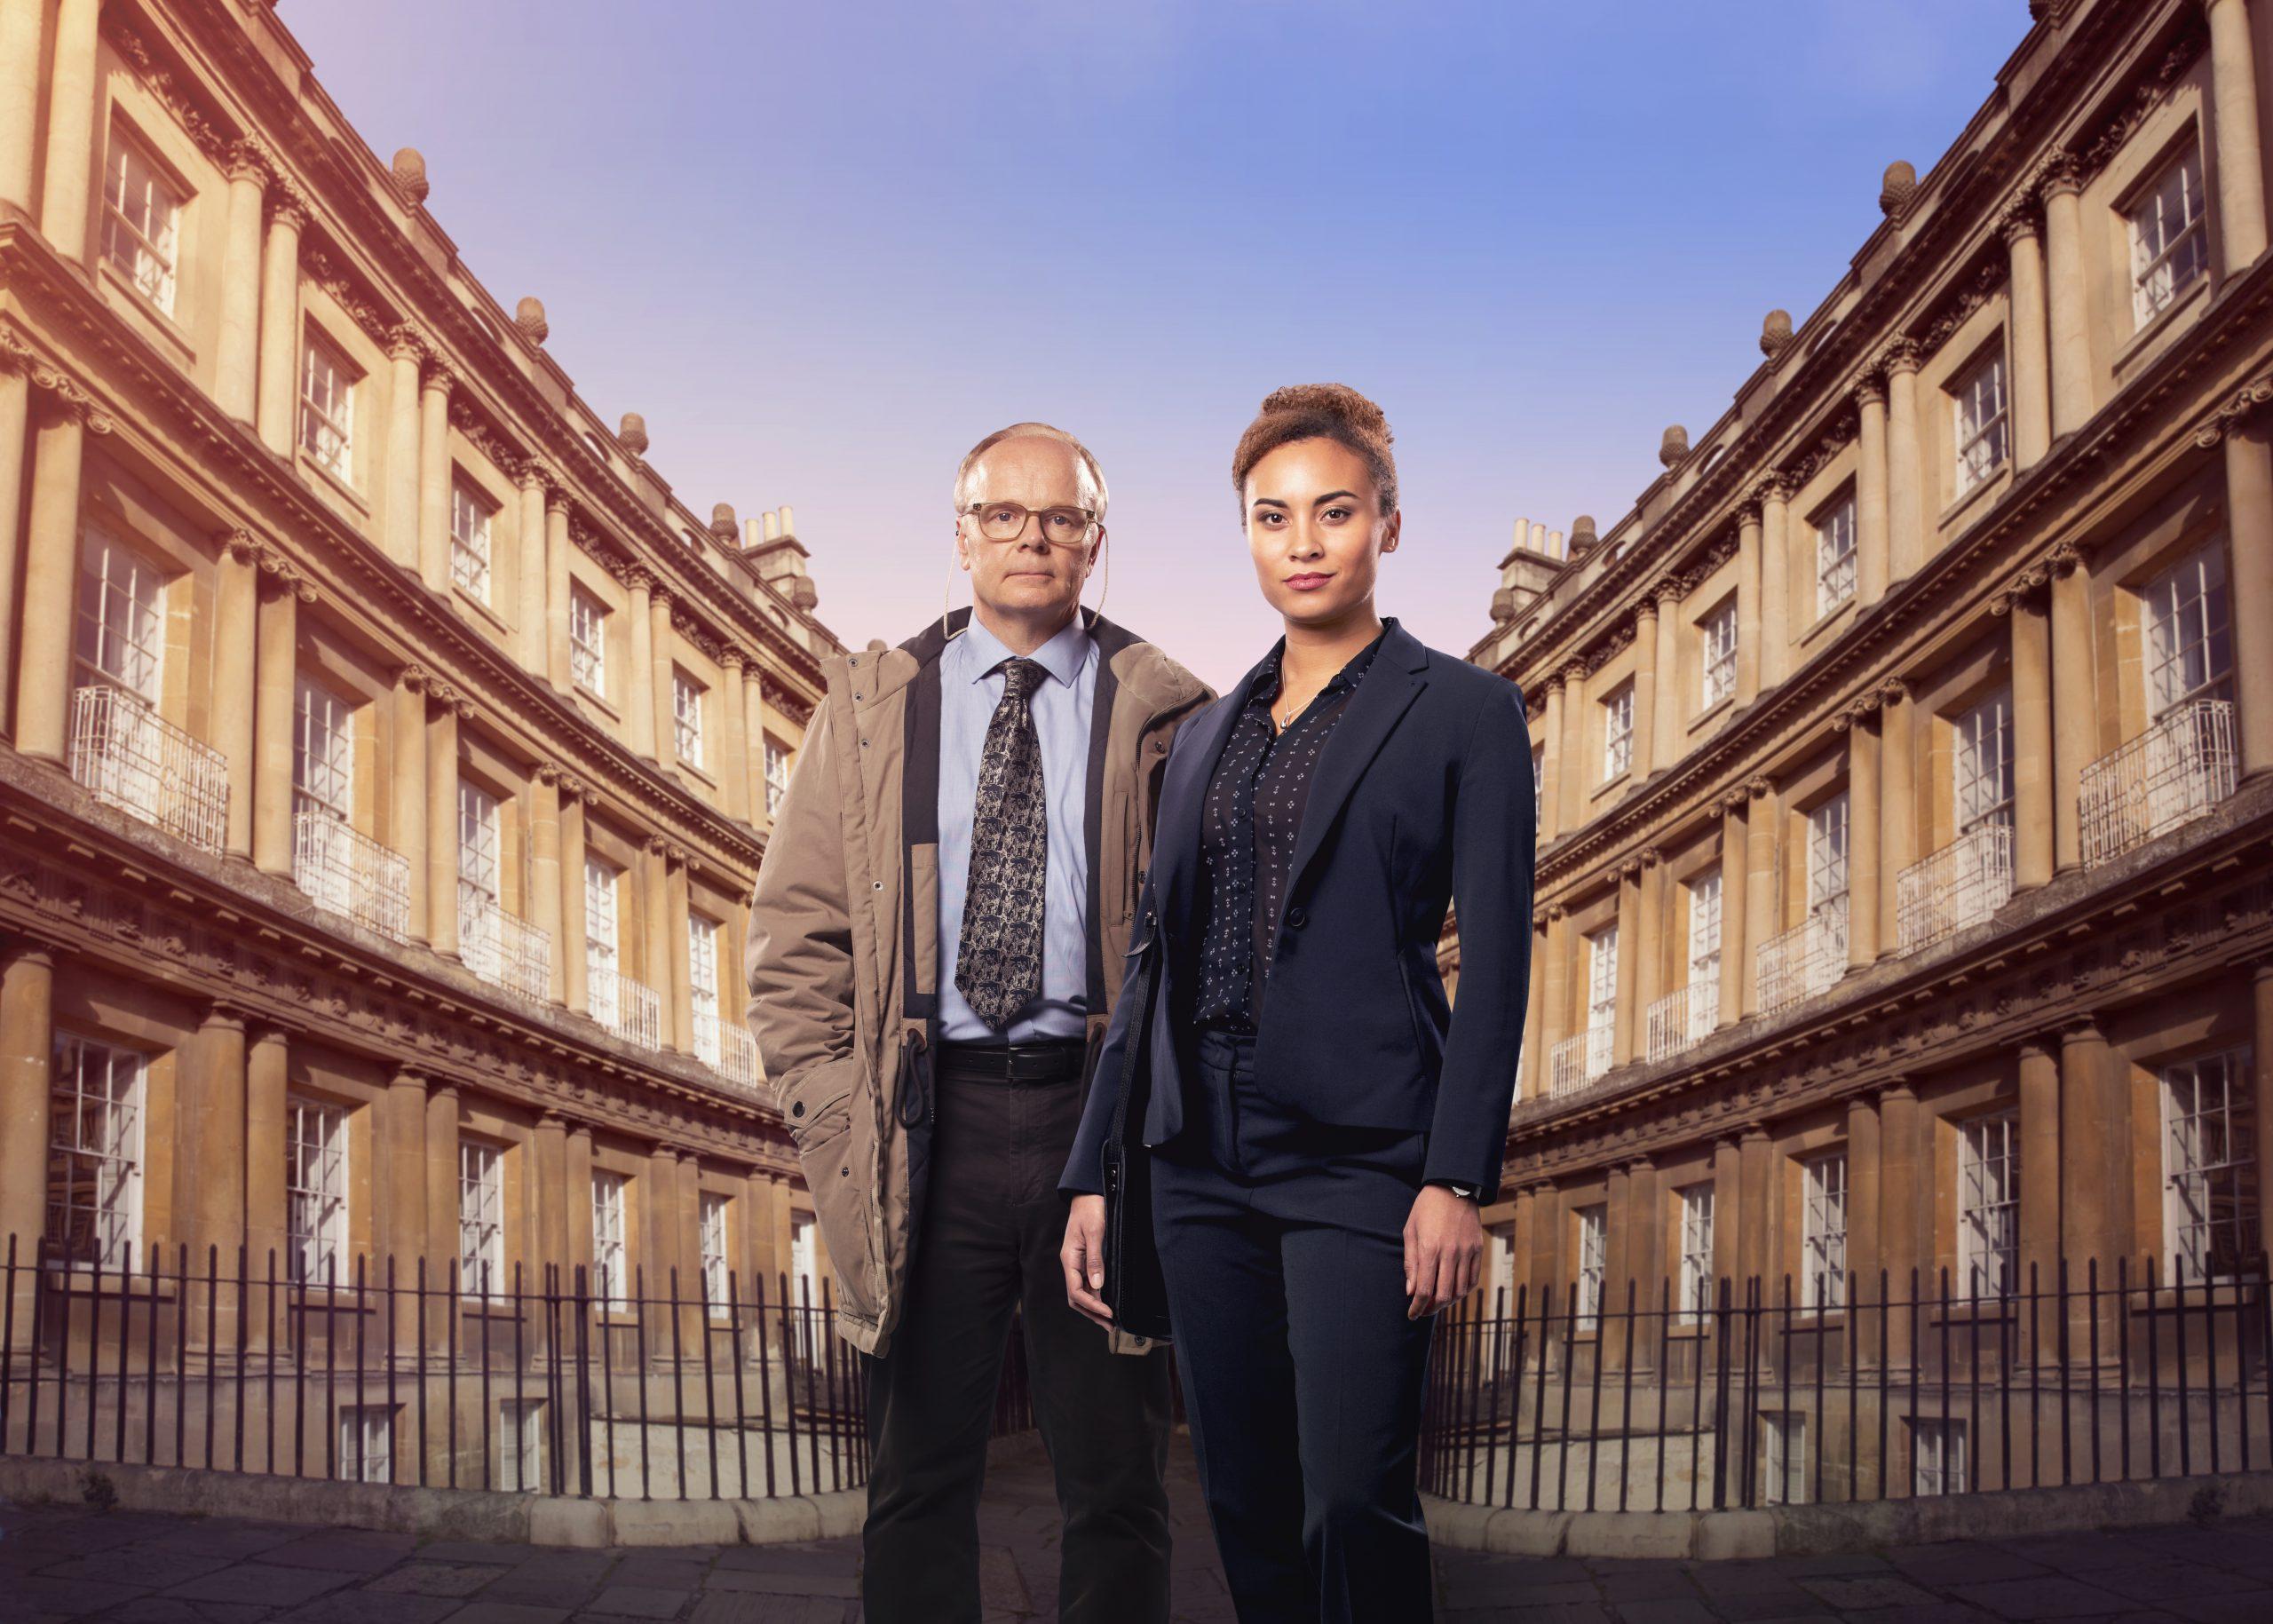 McDonald & Dodds begins filming series 3